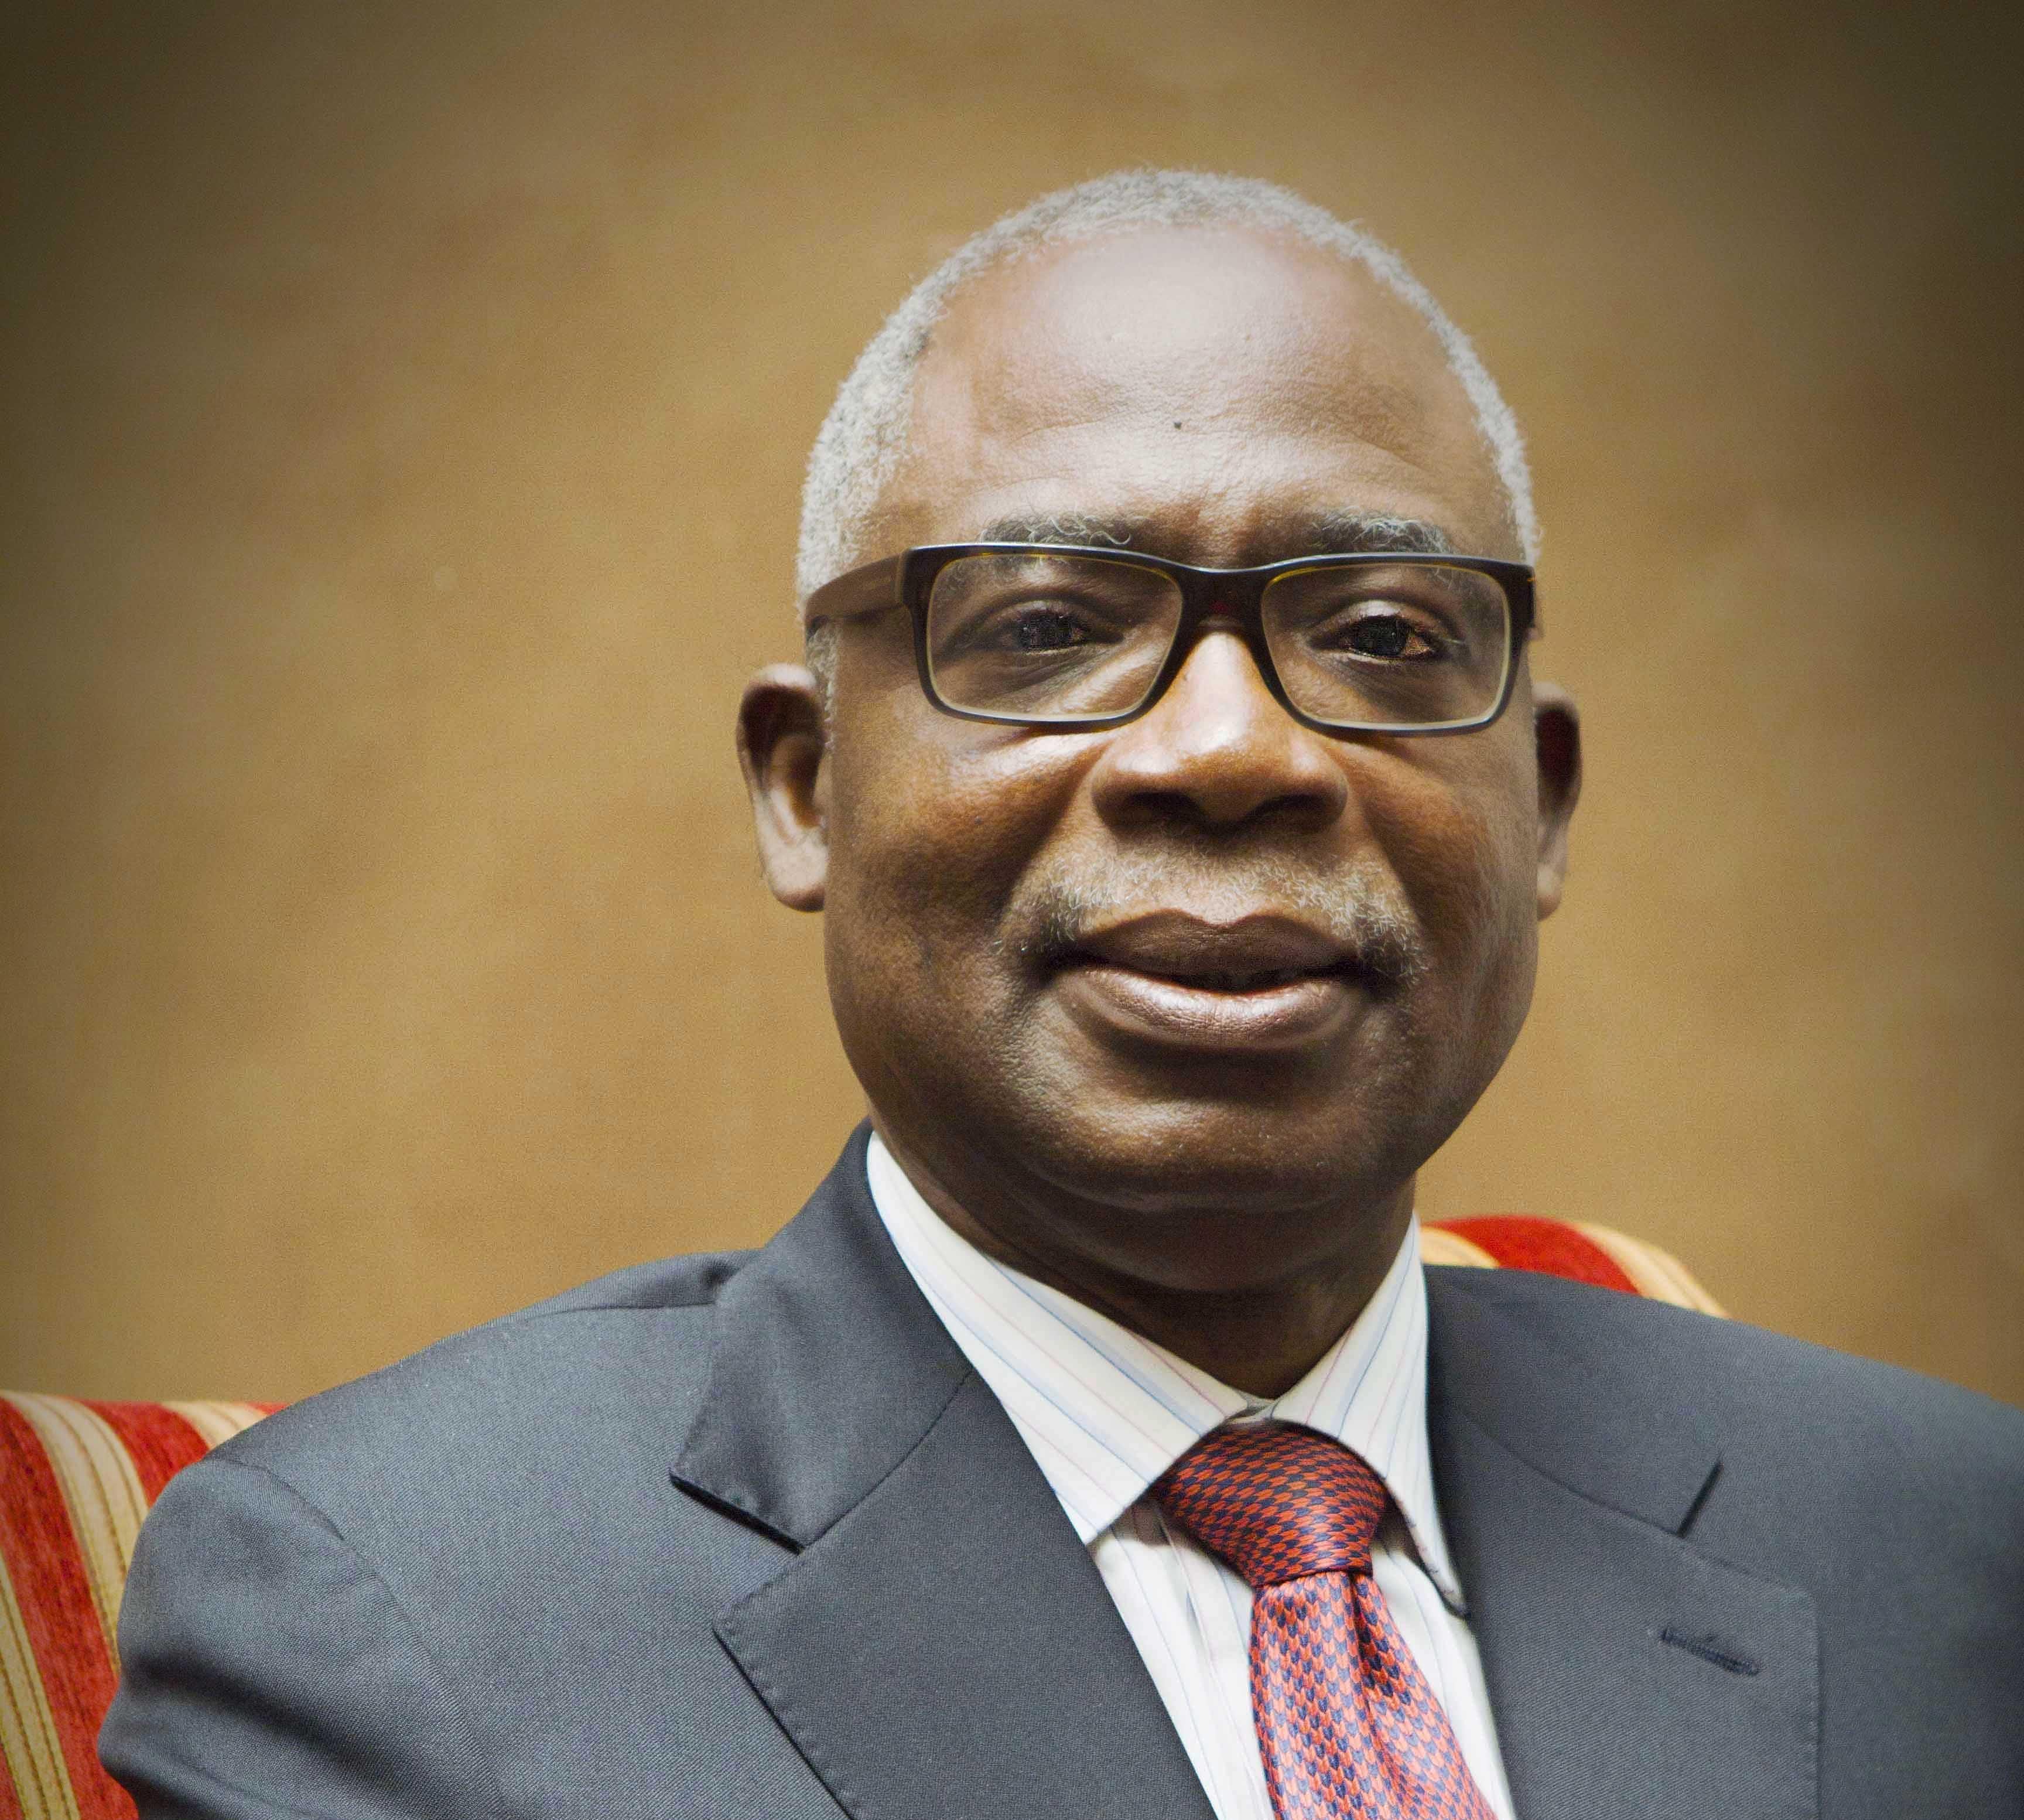 Mr. J. Moyo Ajekigbe